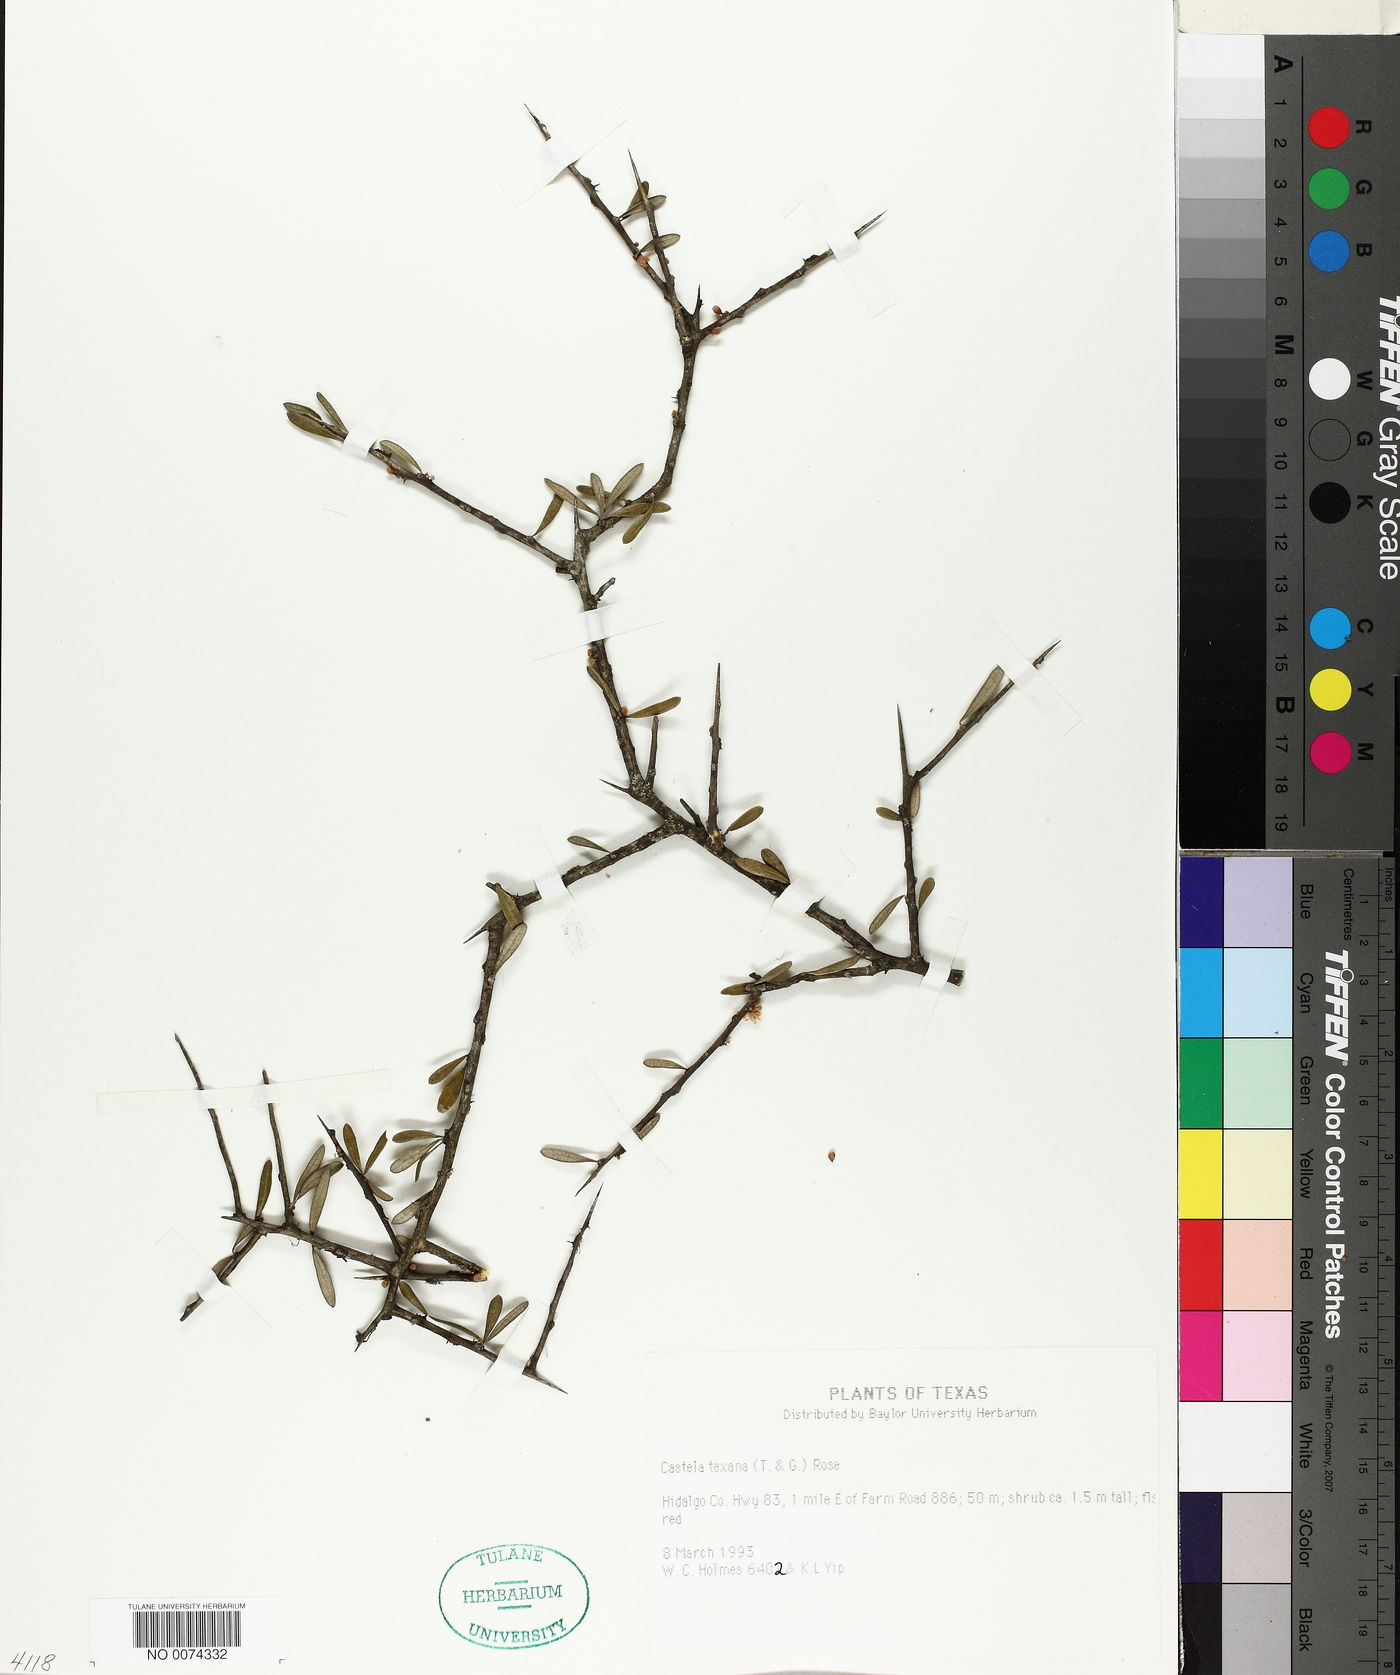 Castela erecta subsp. texana image